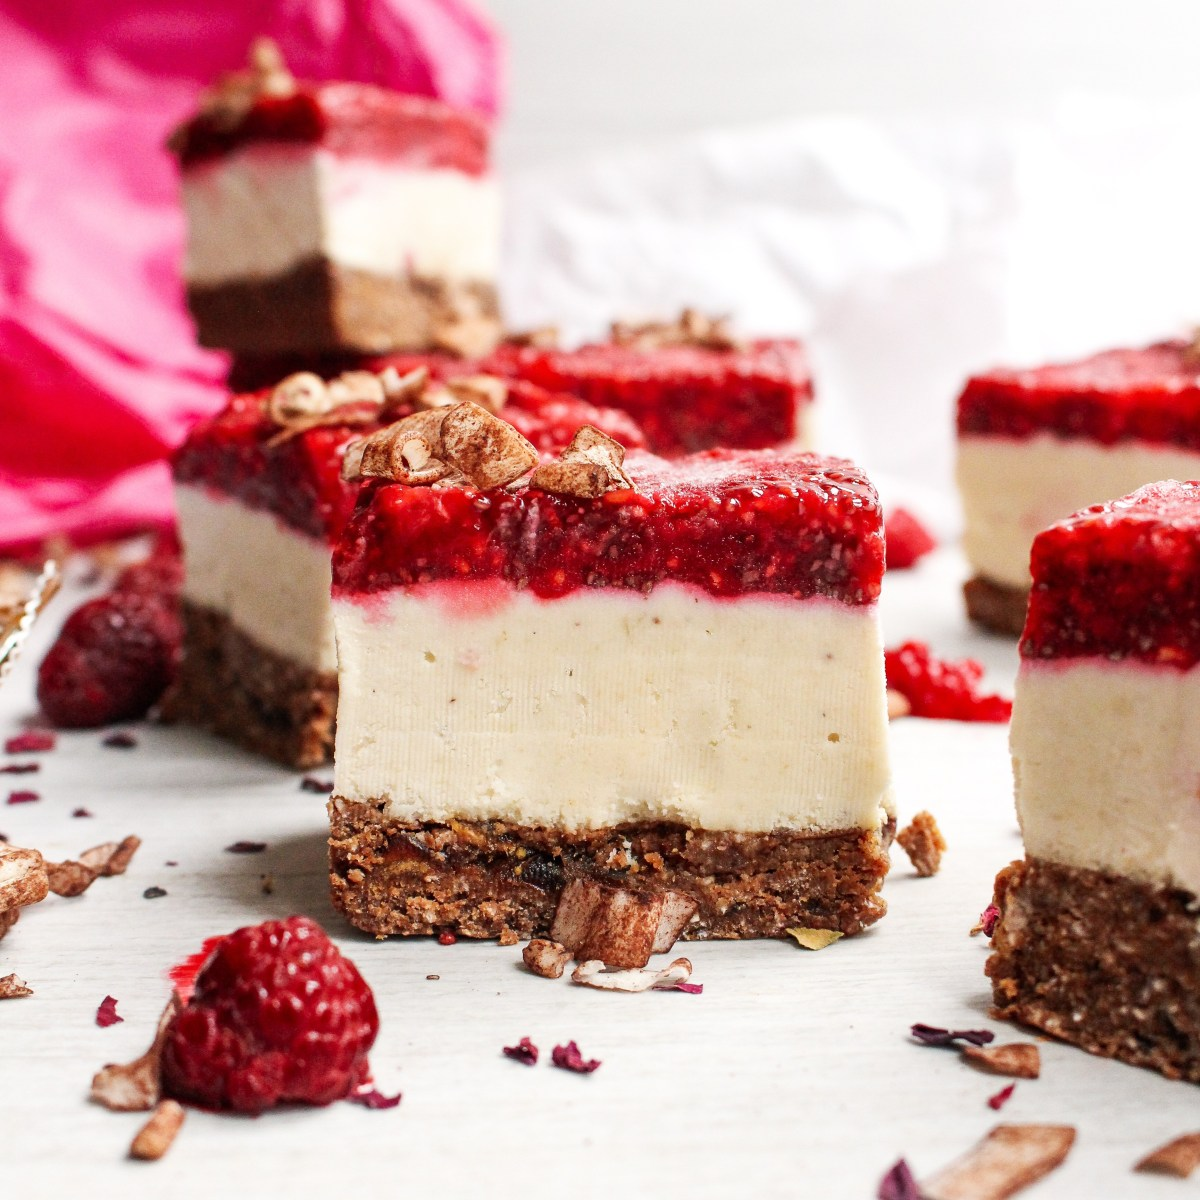 Chocolate Coconut Raspberry Cheesecake Slices